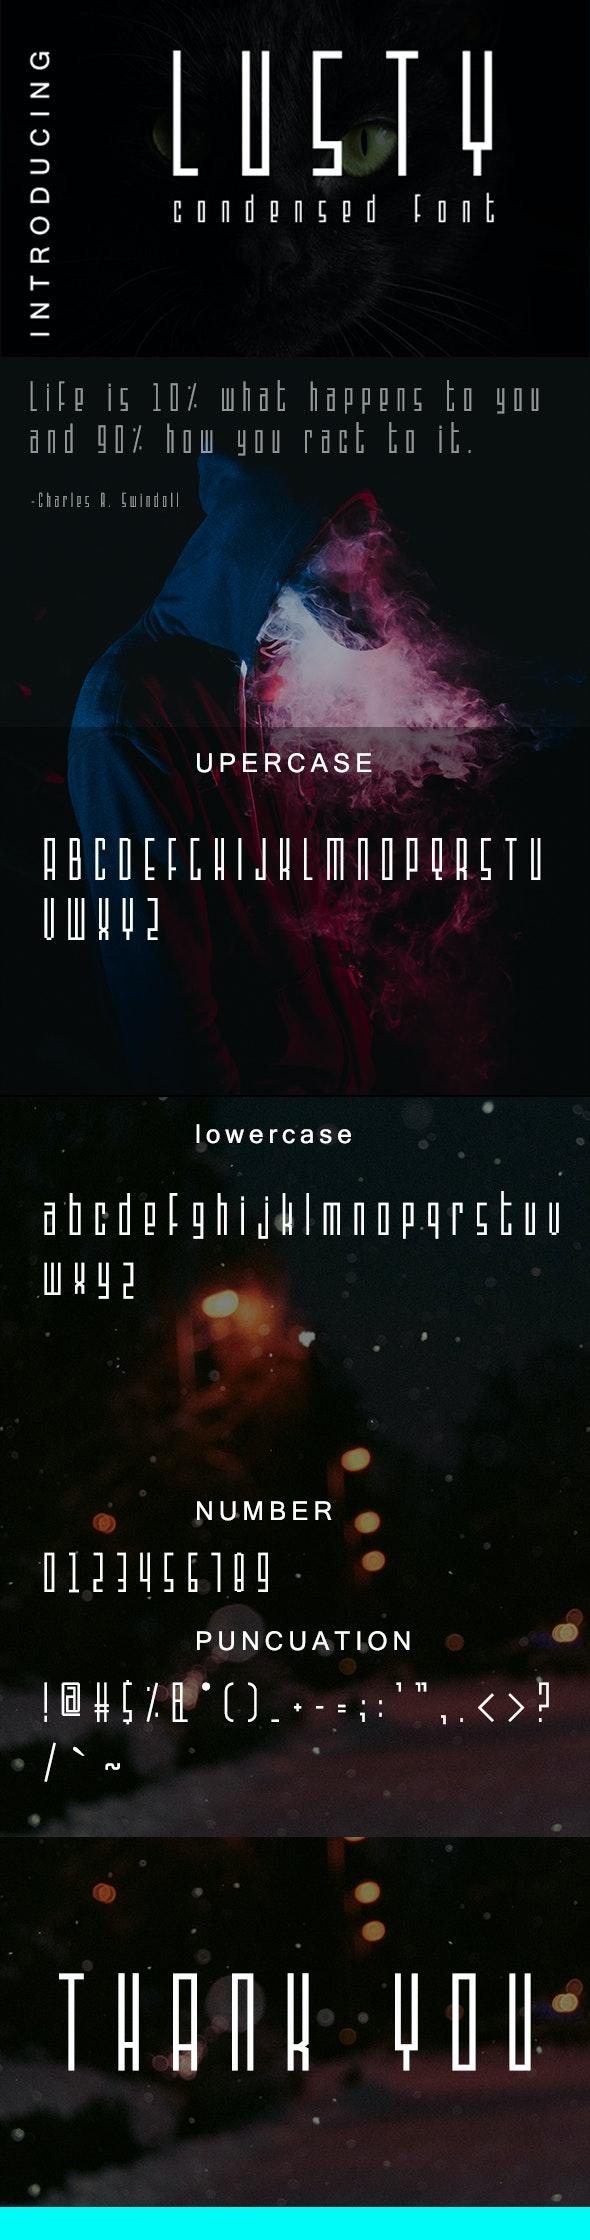 Lusty - Condensed Font - Condensed Sans-Serif